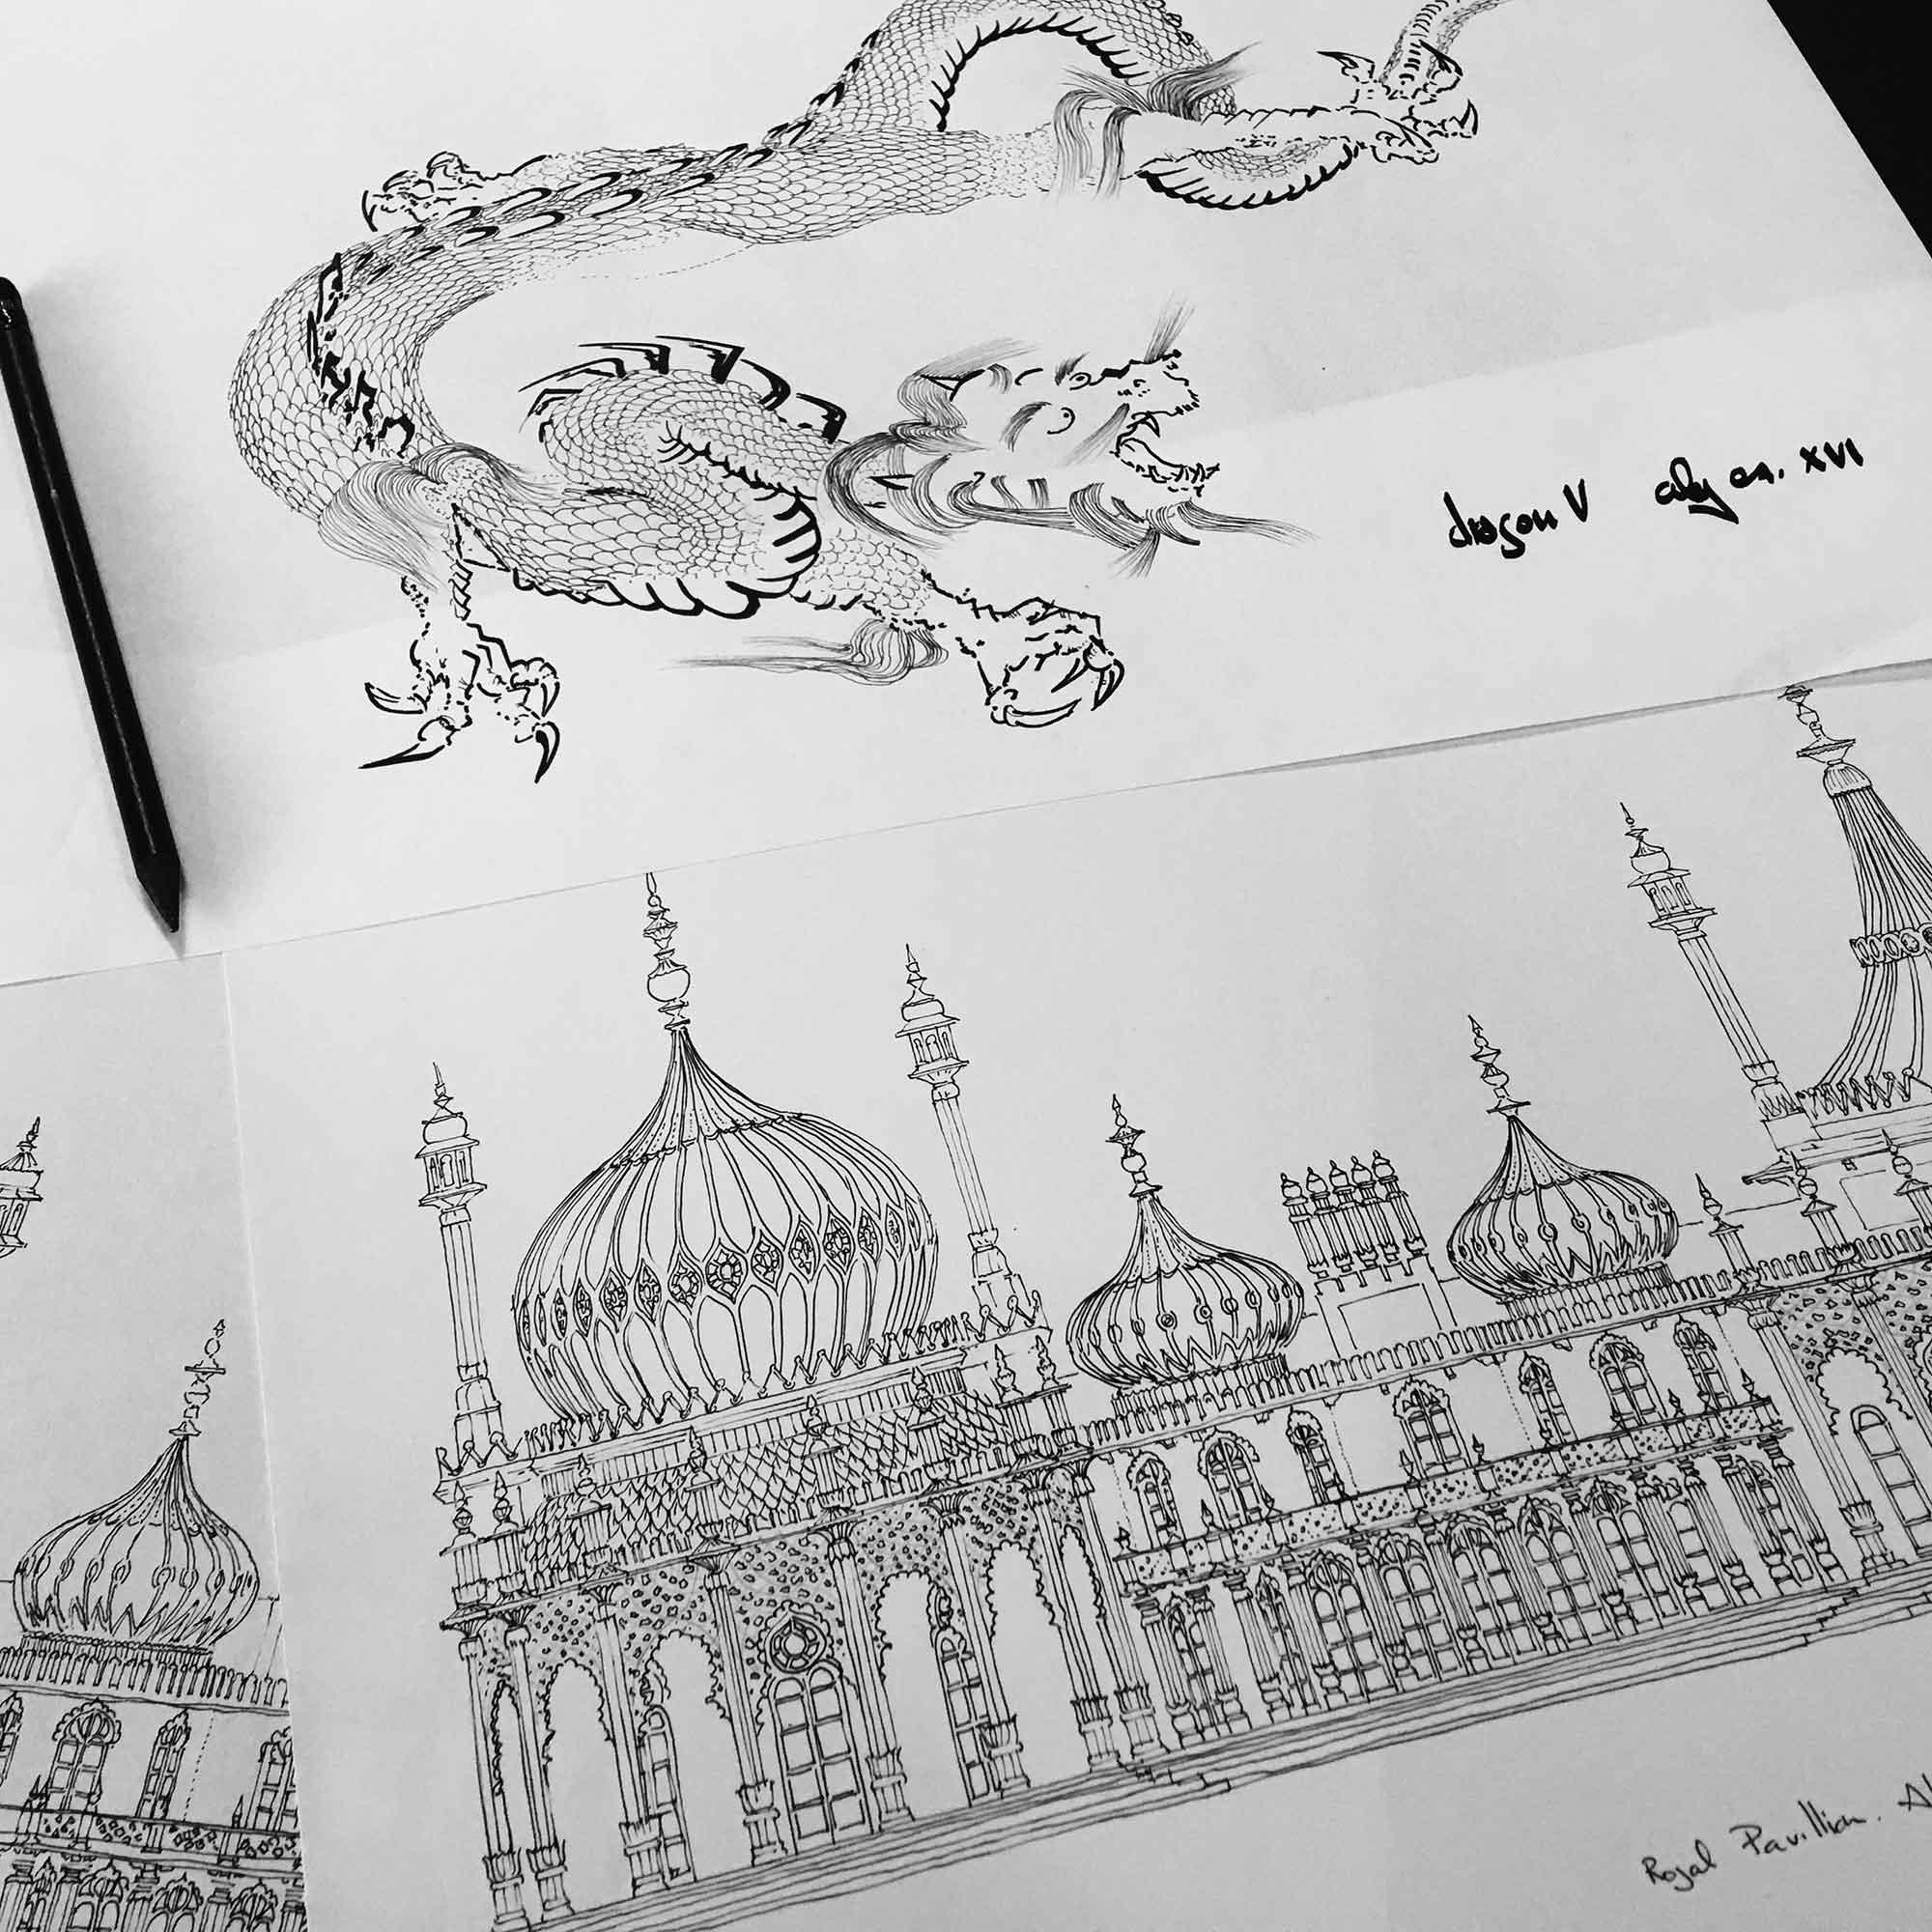 base drawings for print named Chinoiseriez Life Joy by artist alej ez